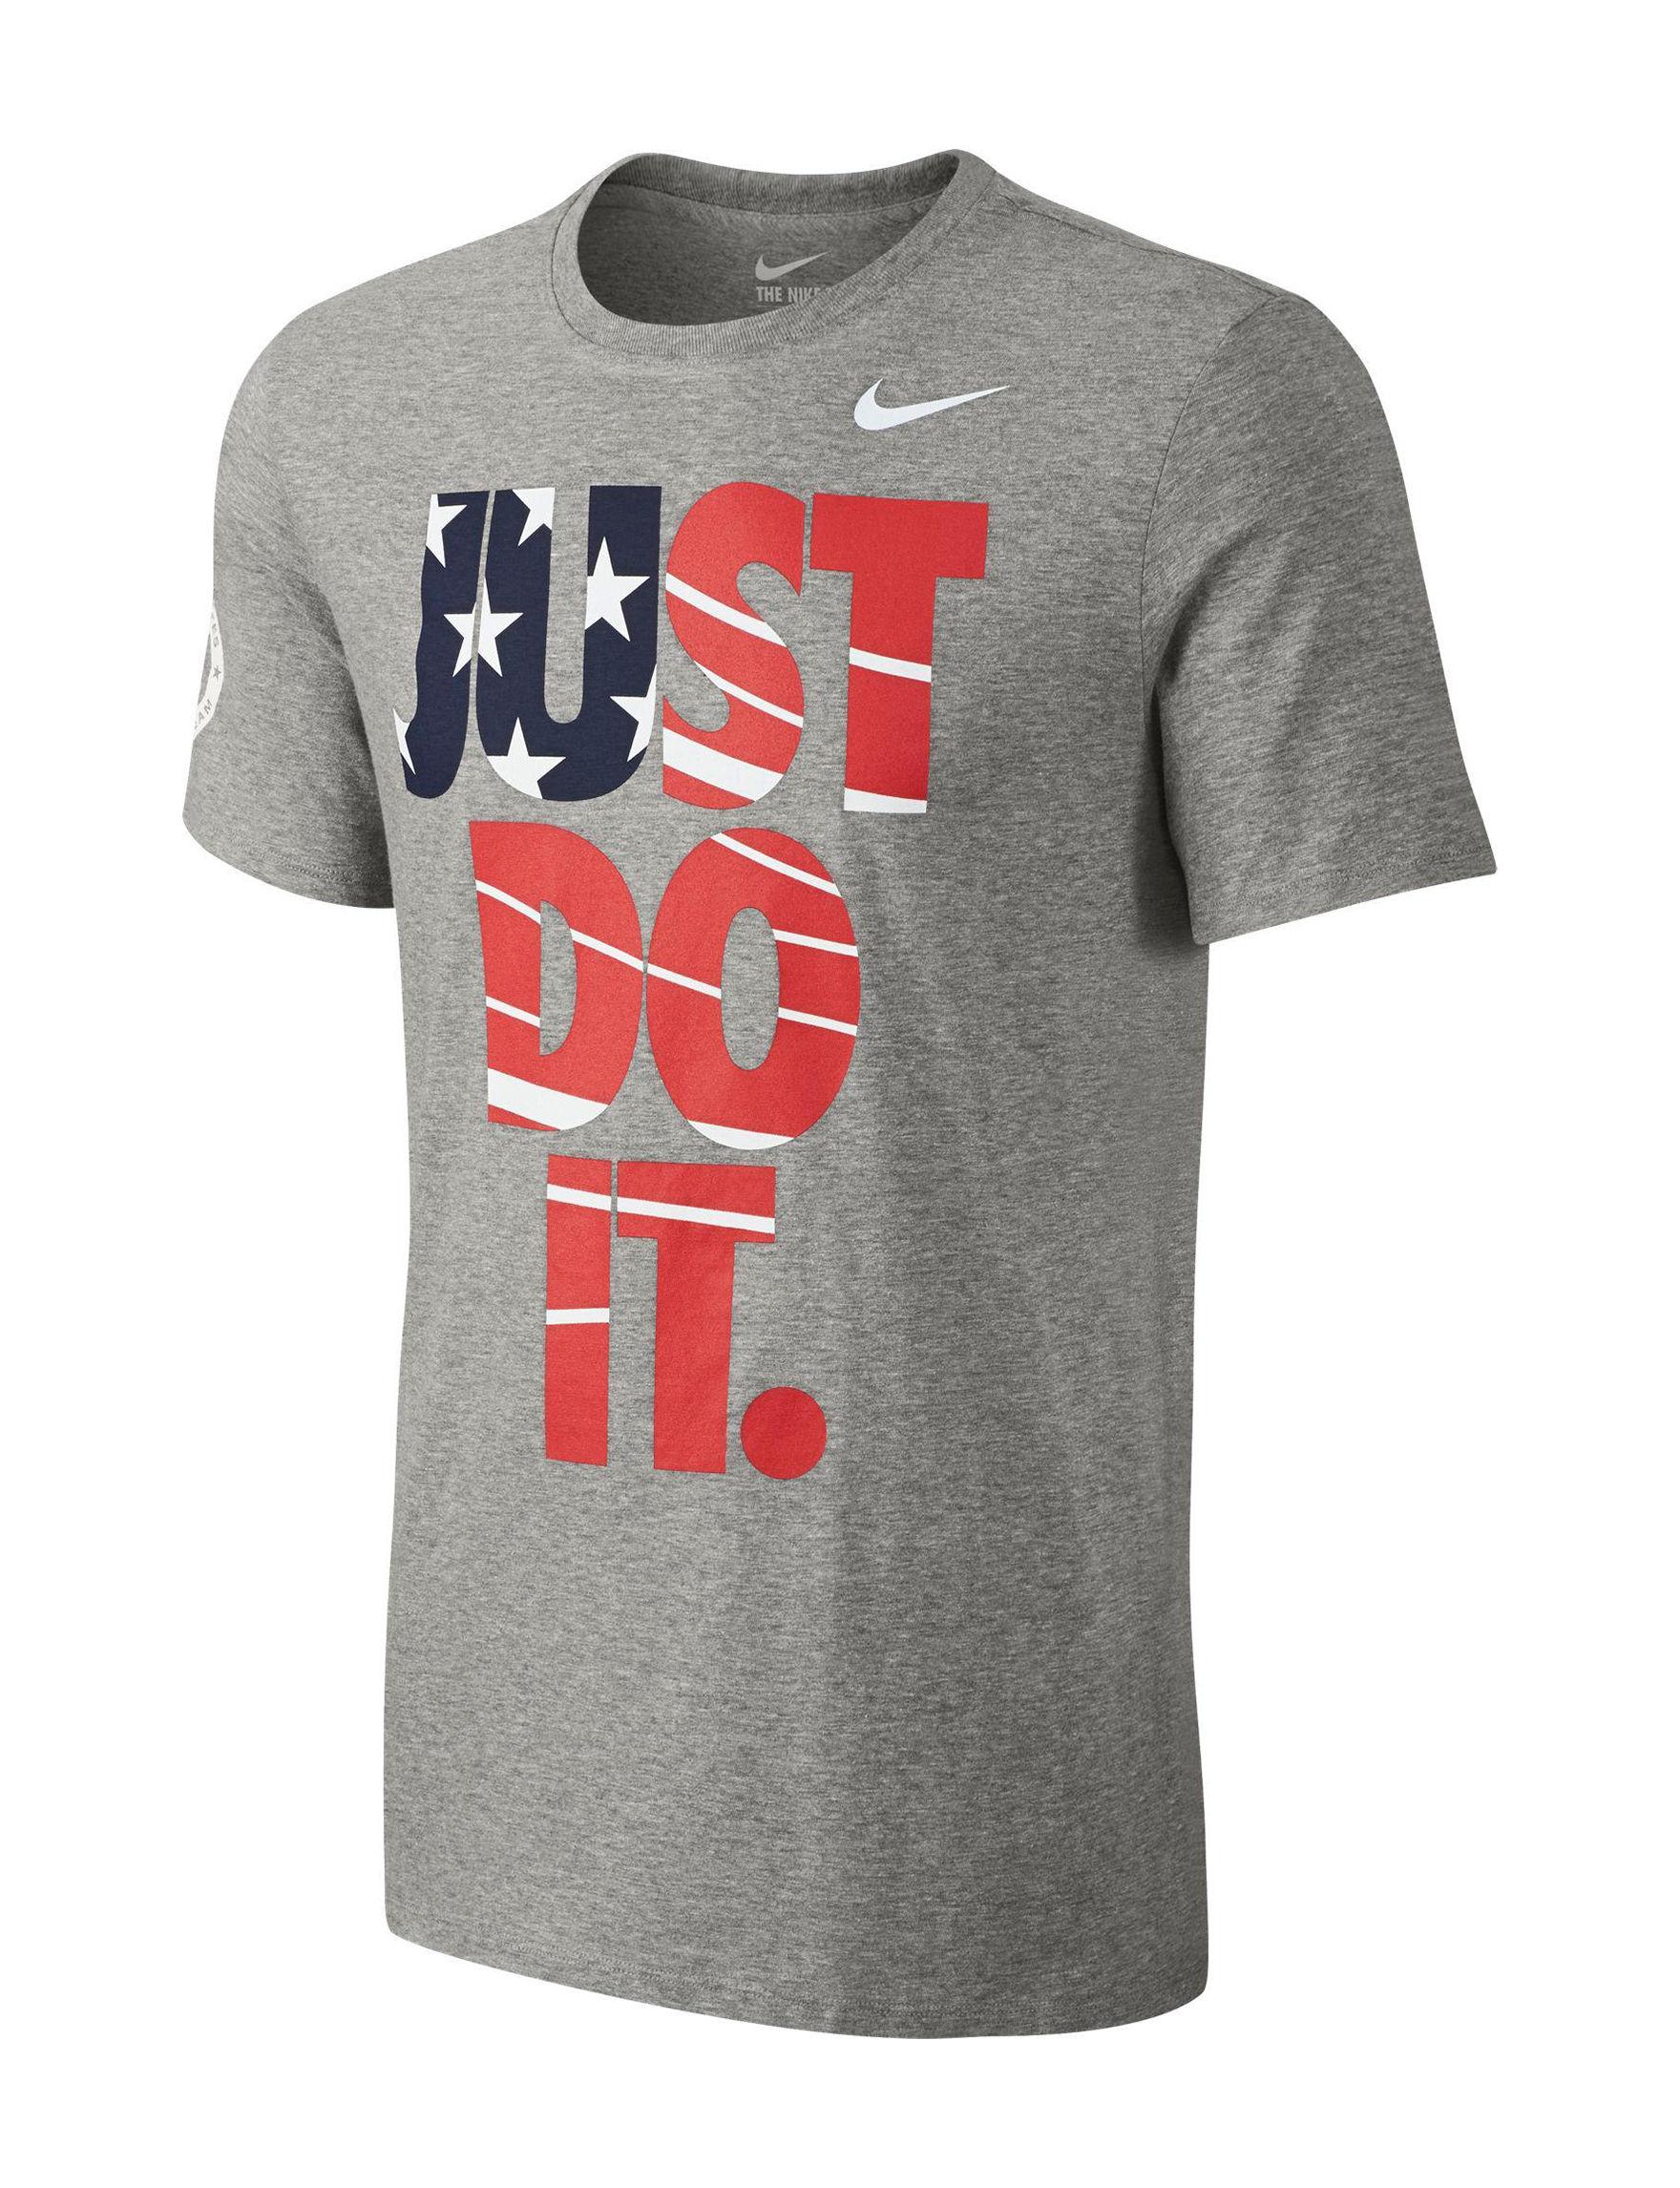 Nike Grey / White Tees & Tanks